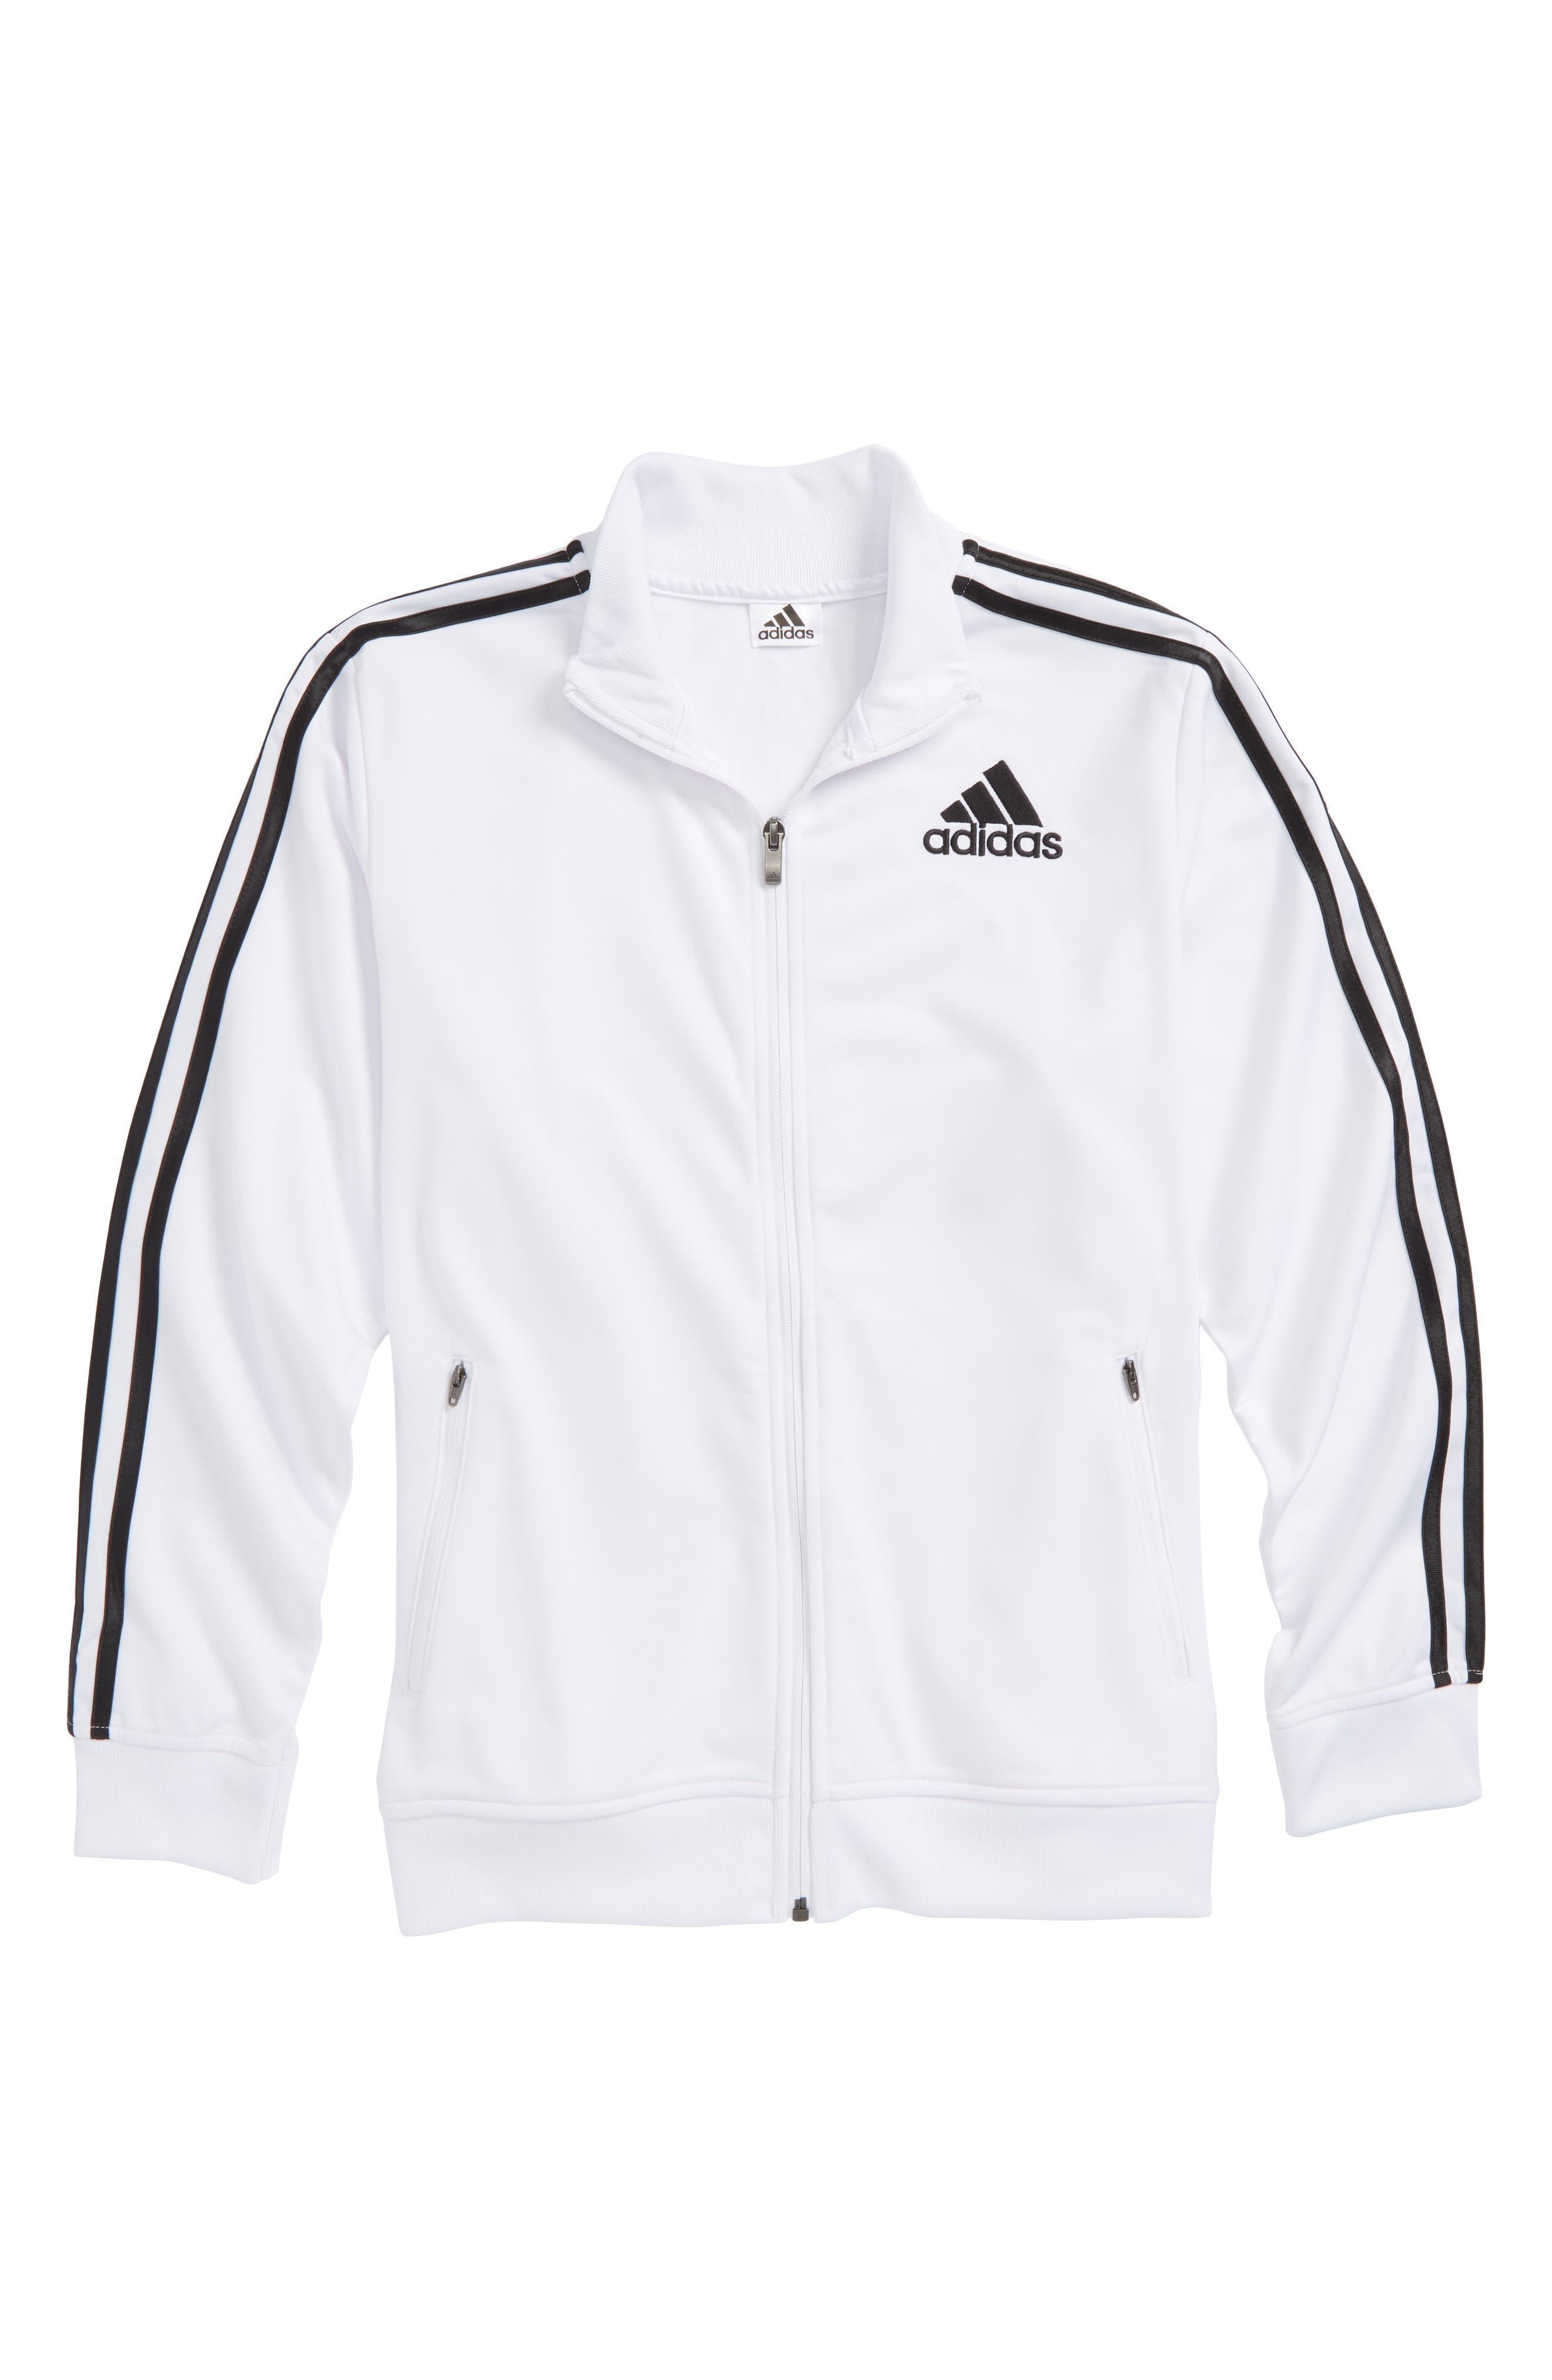 Co-Ed Designator Jacket,                             Main thumbnail 1, color,                             White/ Black